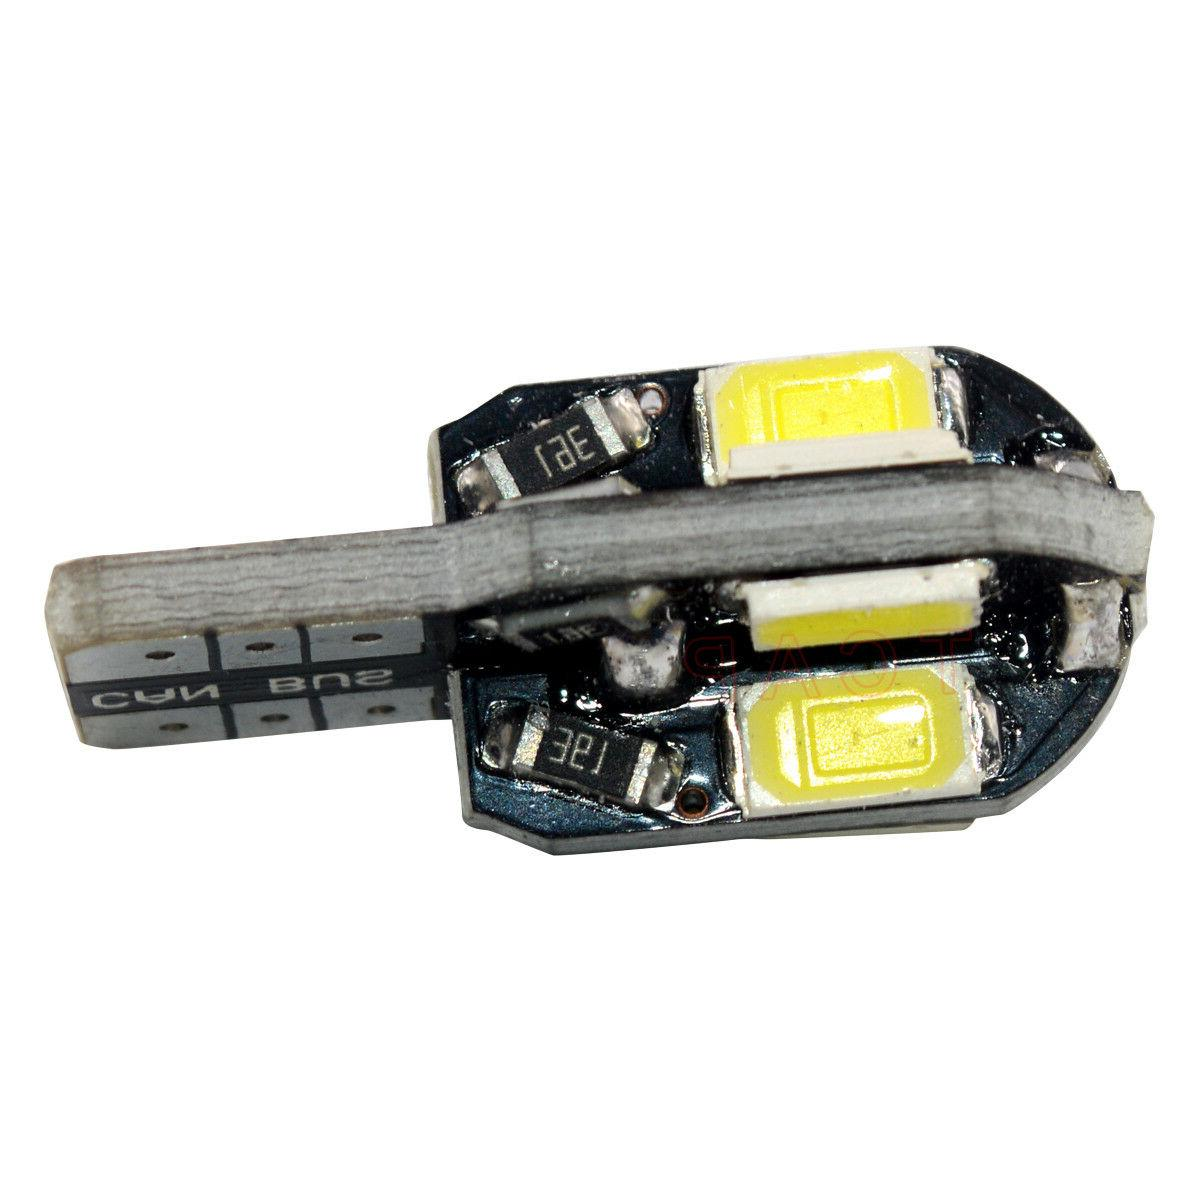 10PCS Canbus T10 168 5730 LED Side